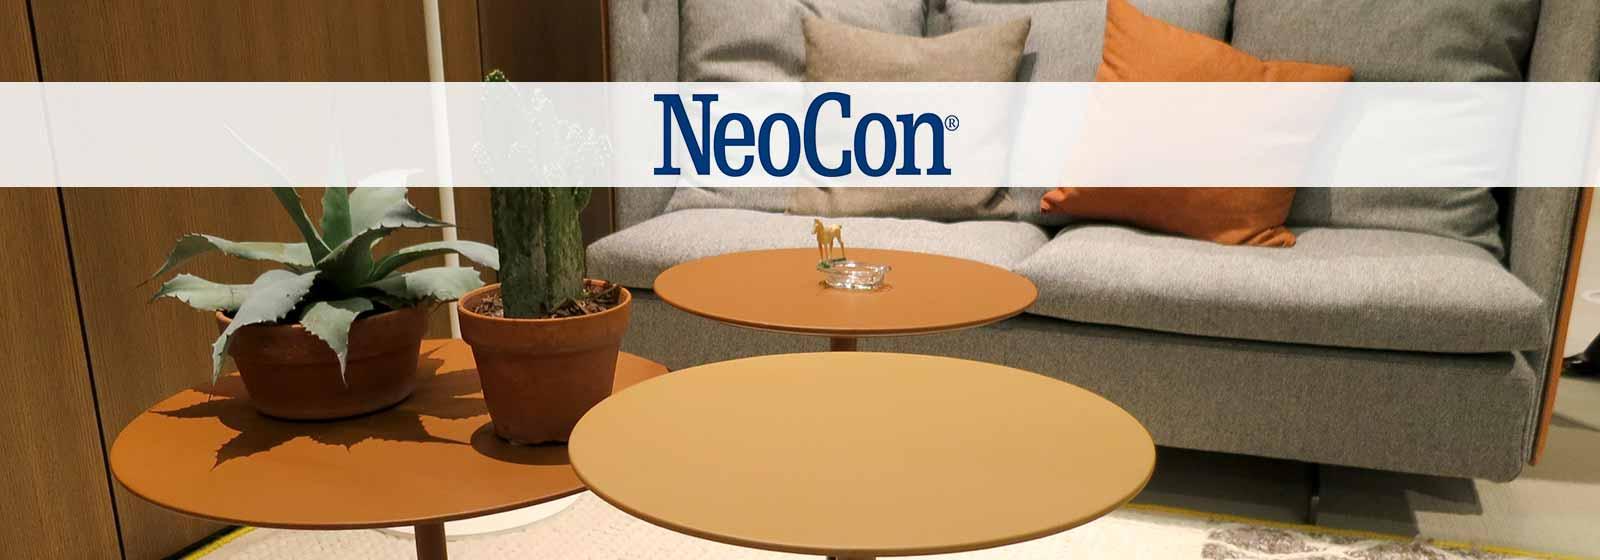 neocon2014 wdm interior architects wichita ks wdm architects